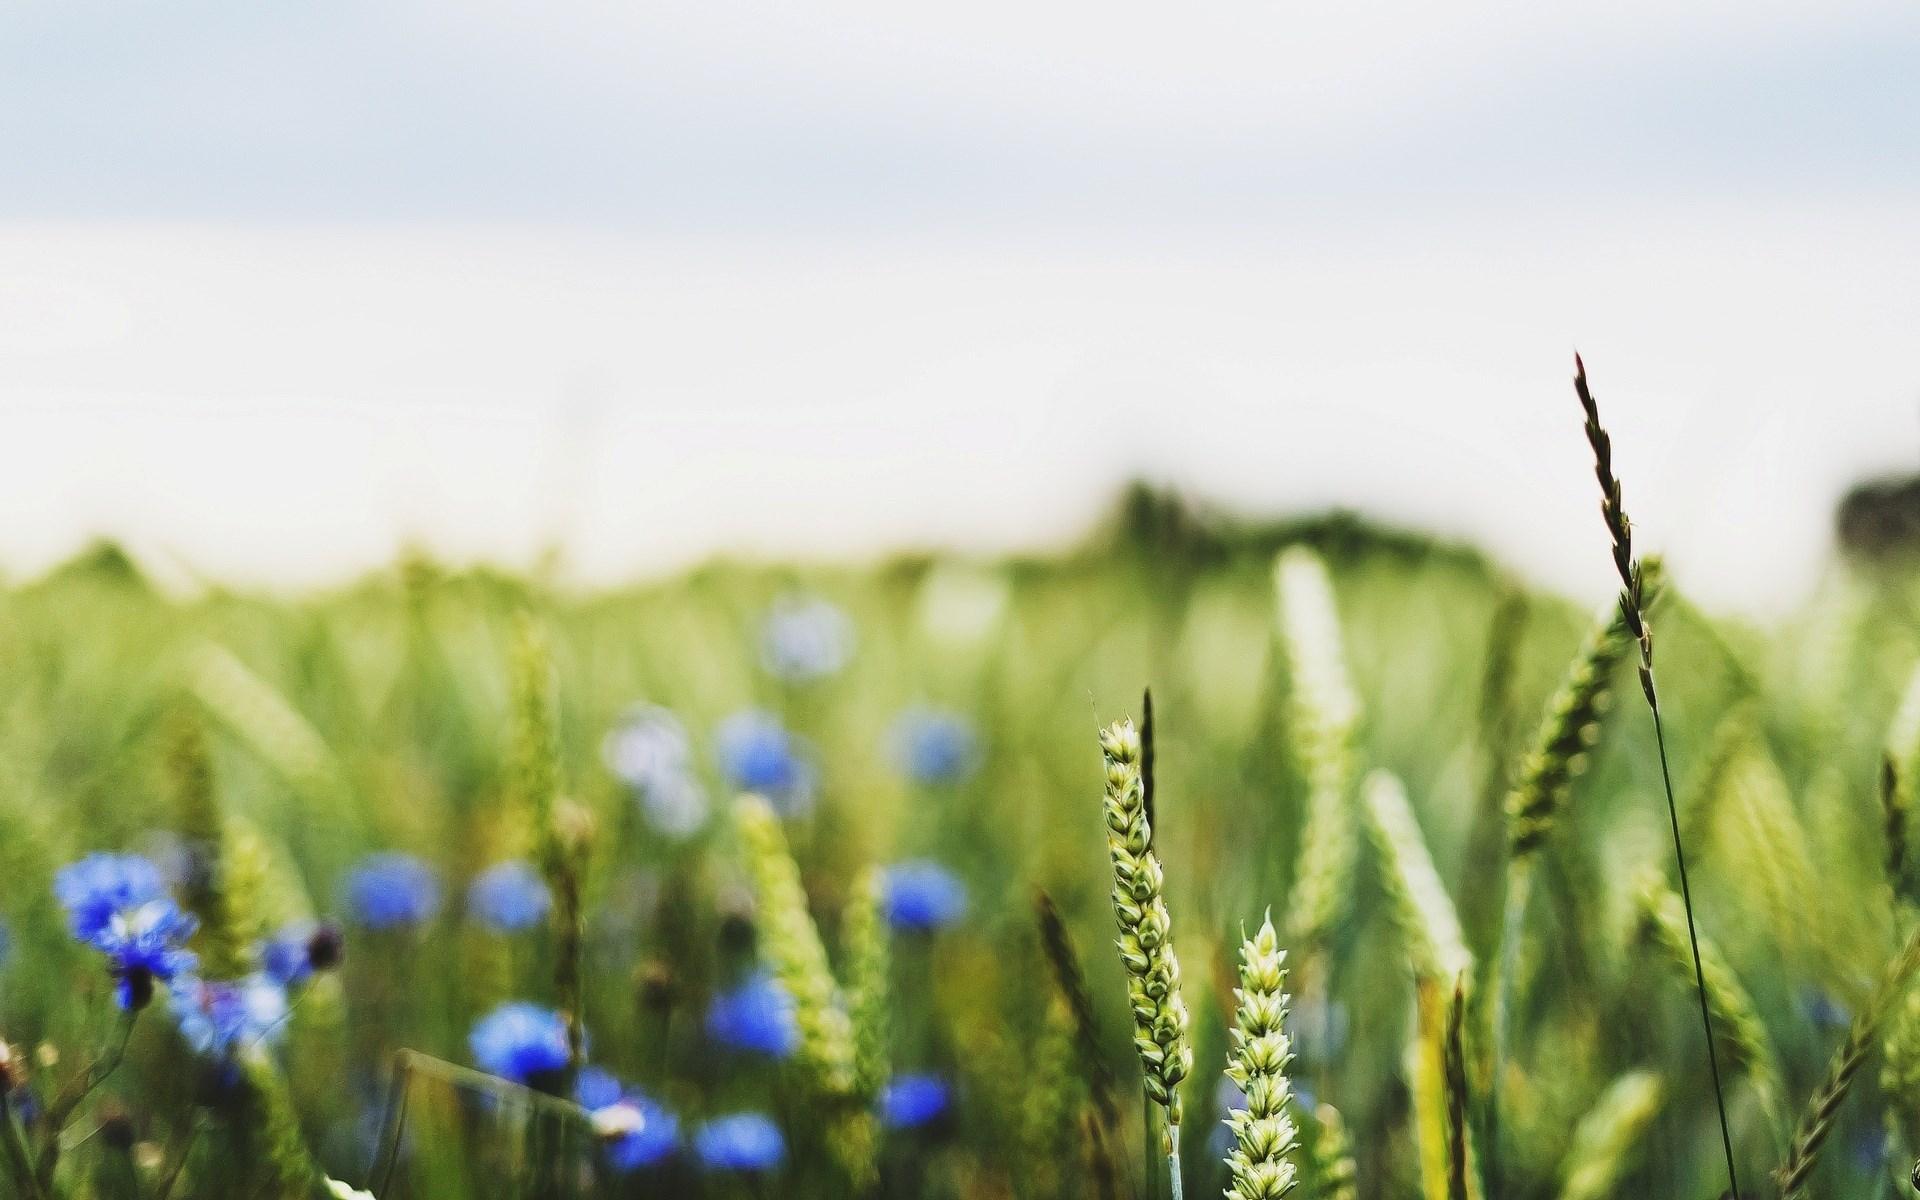 Field Wheat Flowers Blue Nature